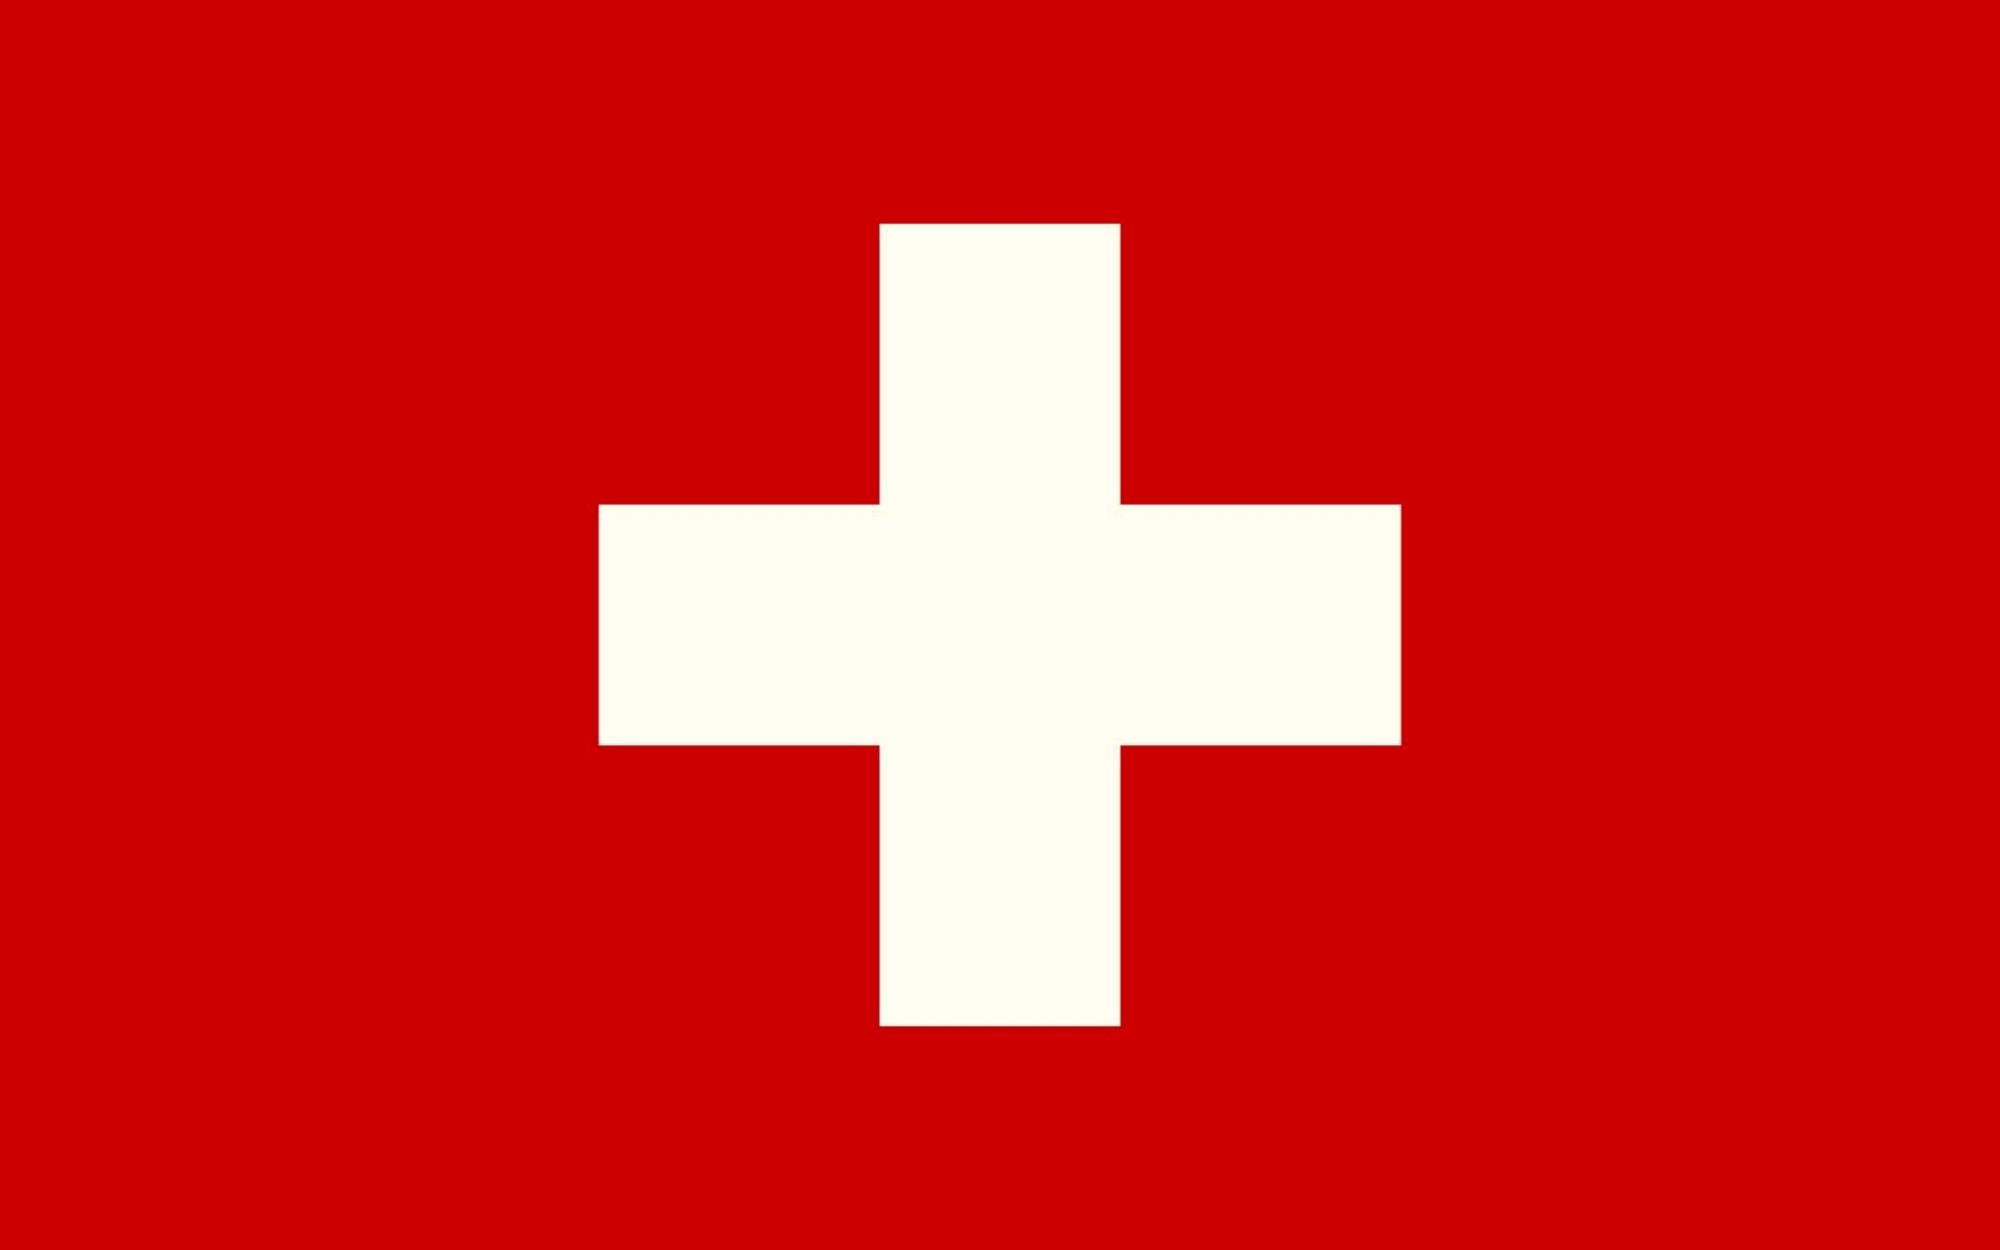 Fotografi famosi svizzeri